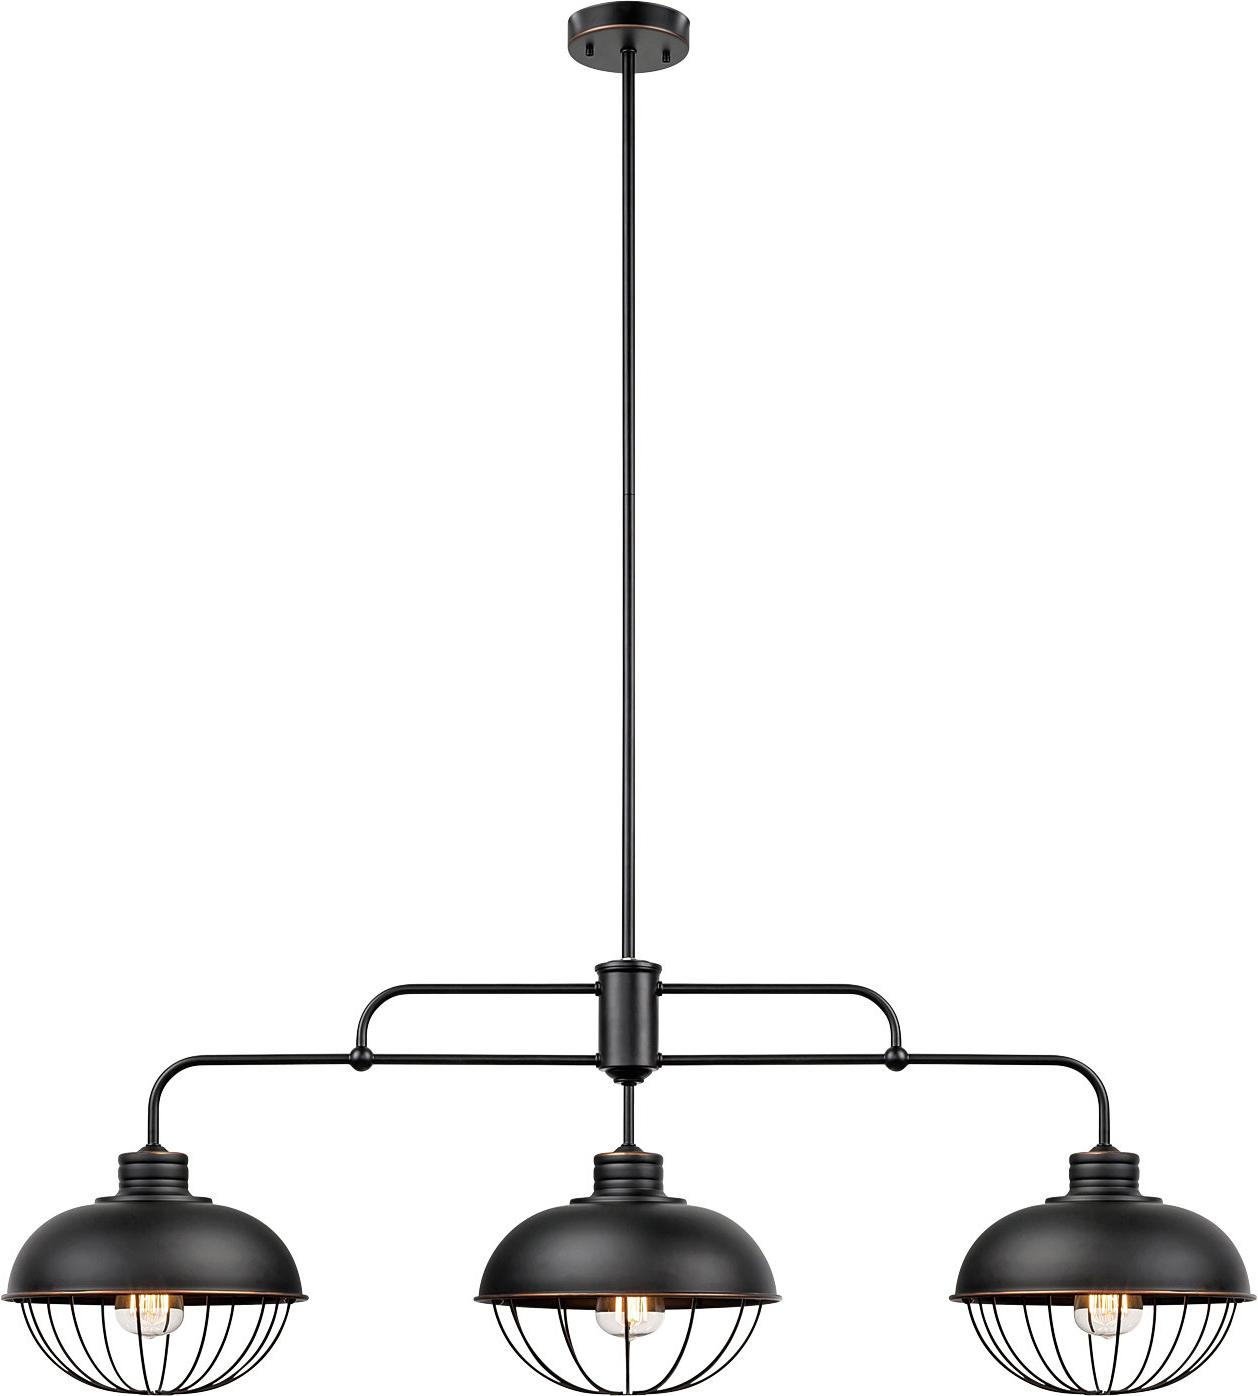 Kathi 3 Light Kitchen Island Linear Pendant With Latest Dunson 3 Light Kitchen Island Pendants (View 11 of 20)